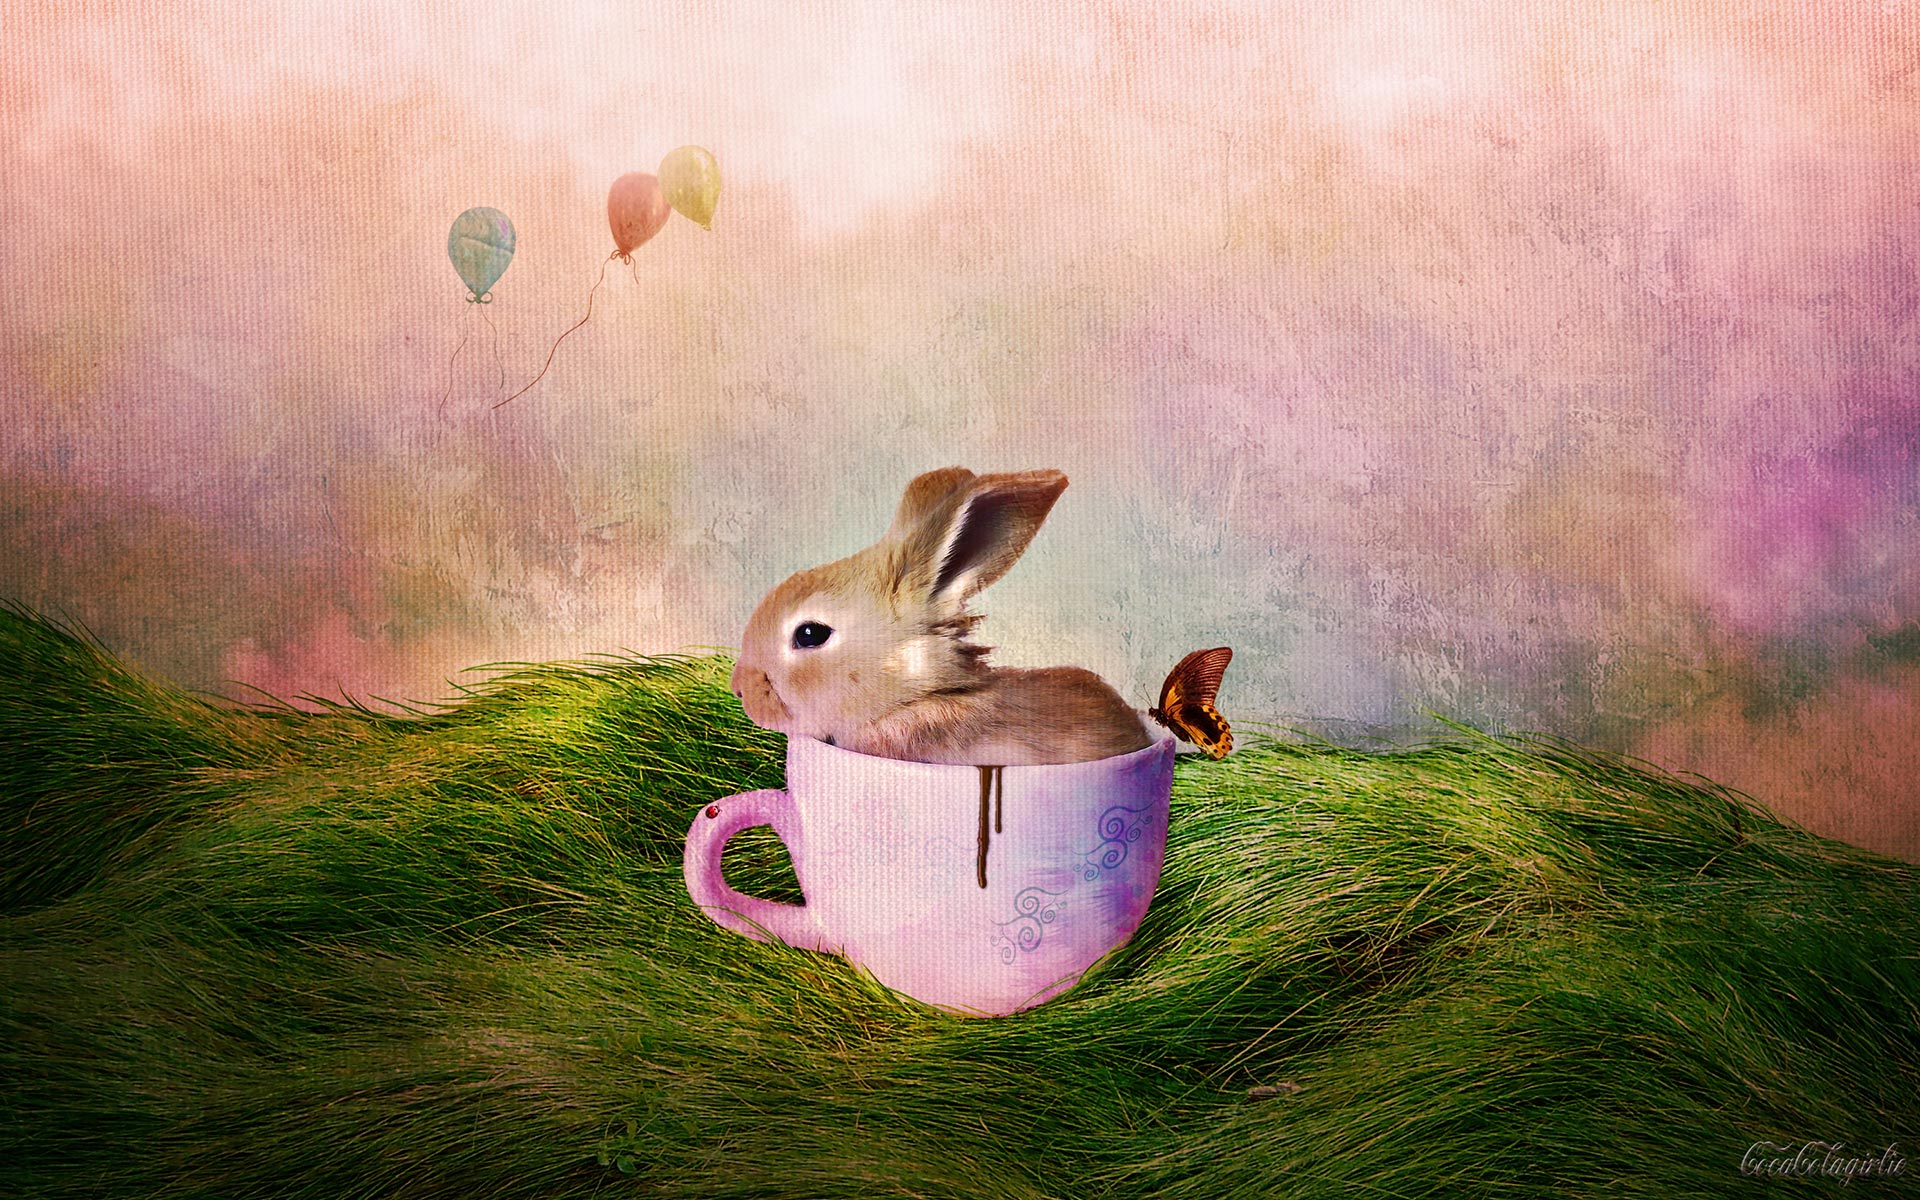 Happy Easter Desktop Backgrounds   Wallpaper High Definition High 1920x1200